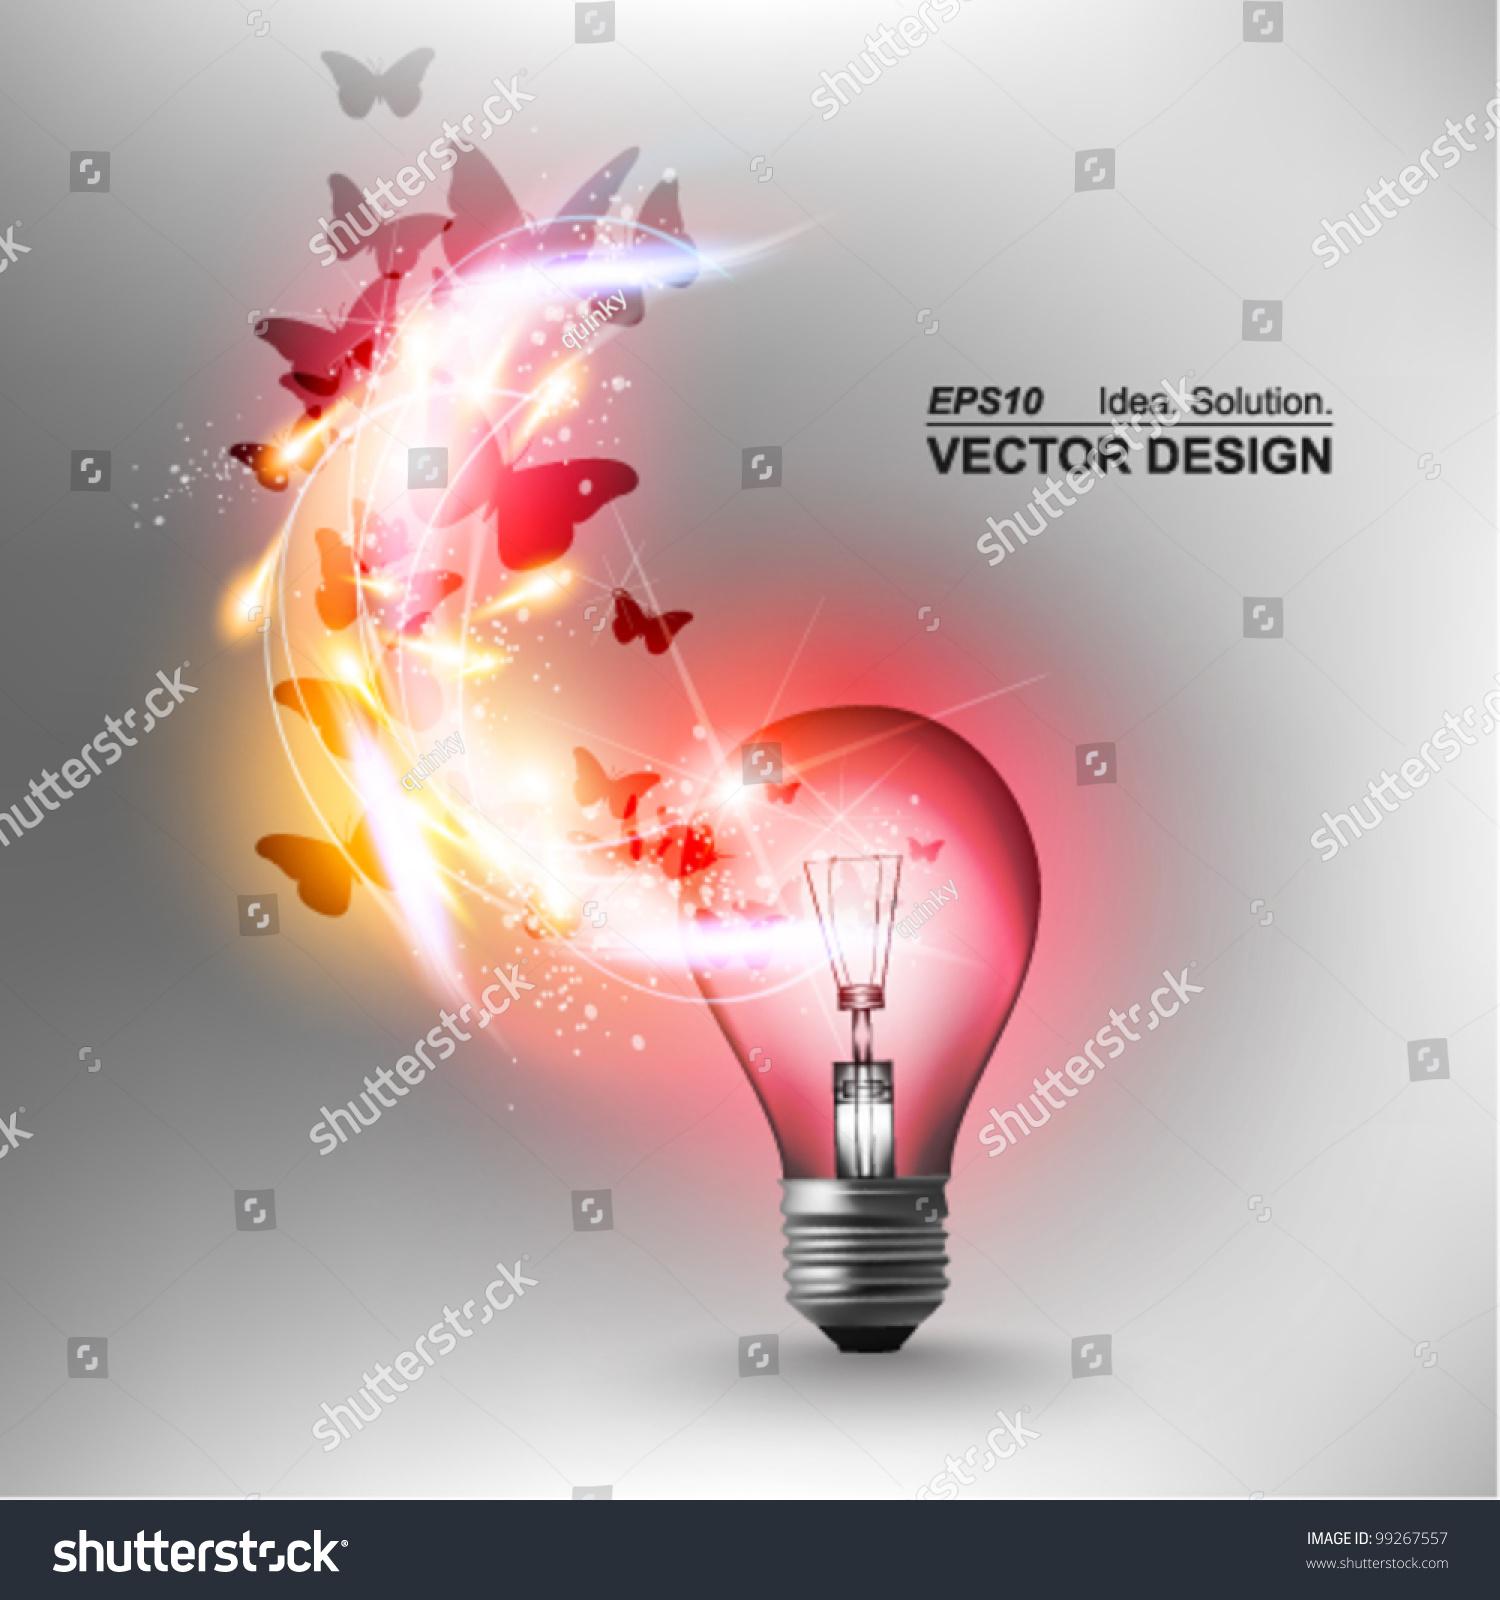 Idea Design save to a lightbox Stylish Conceptual Digital Light Bulb Idea Design Stock Vector Illustration 99267557 Shutterstock